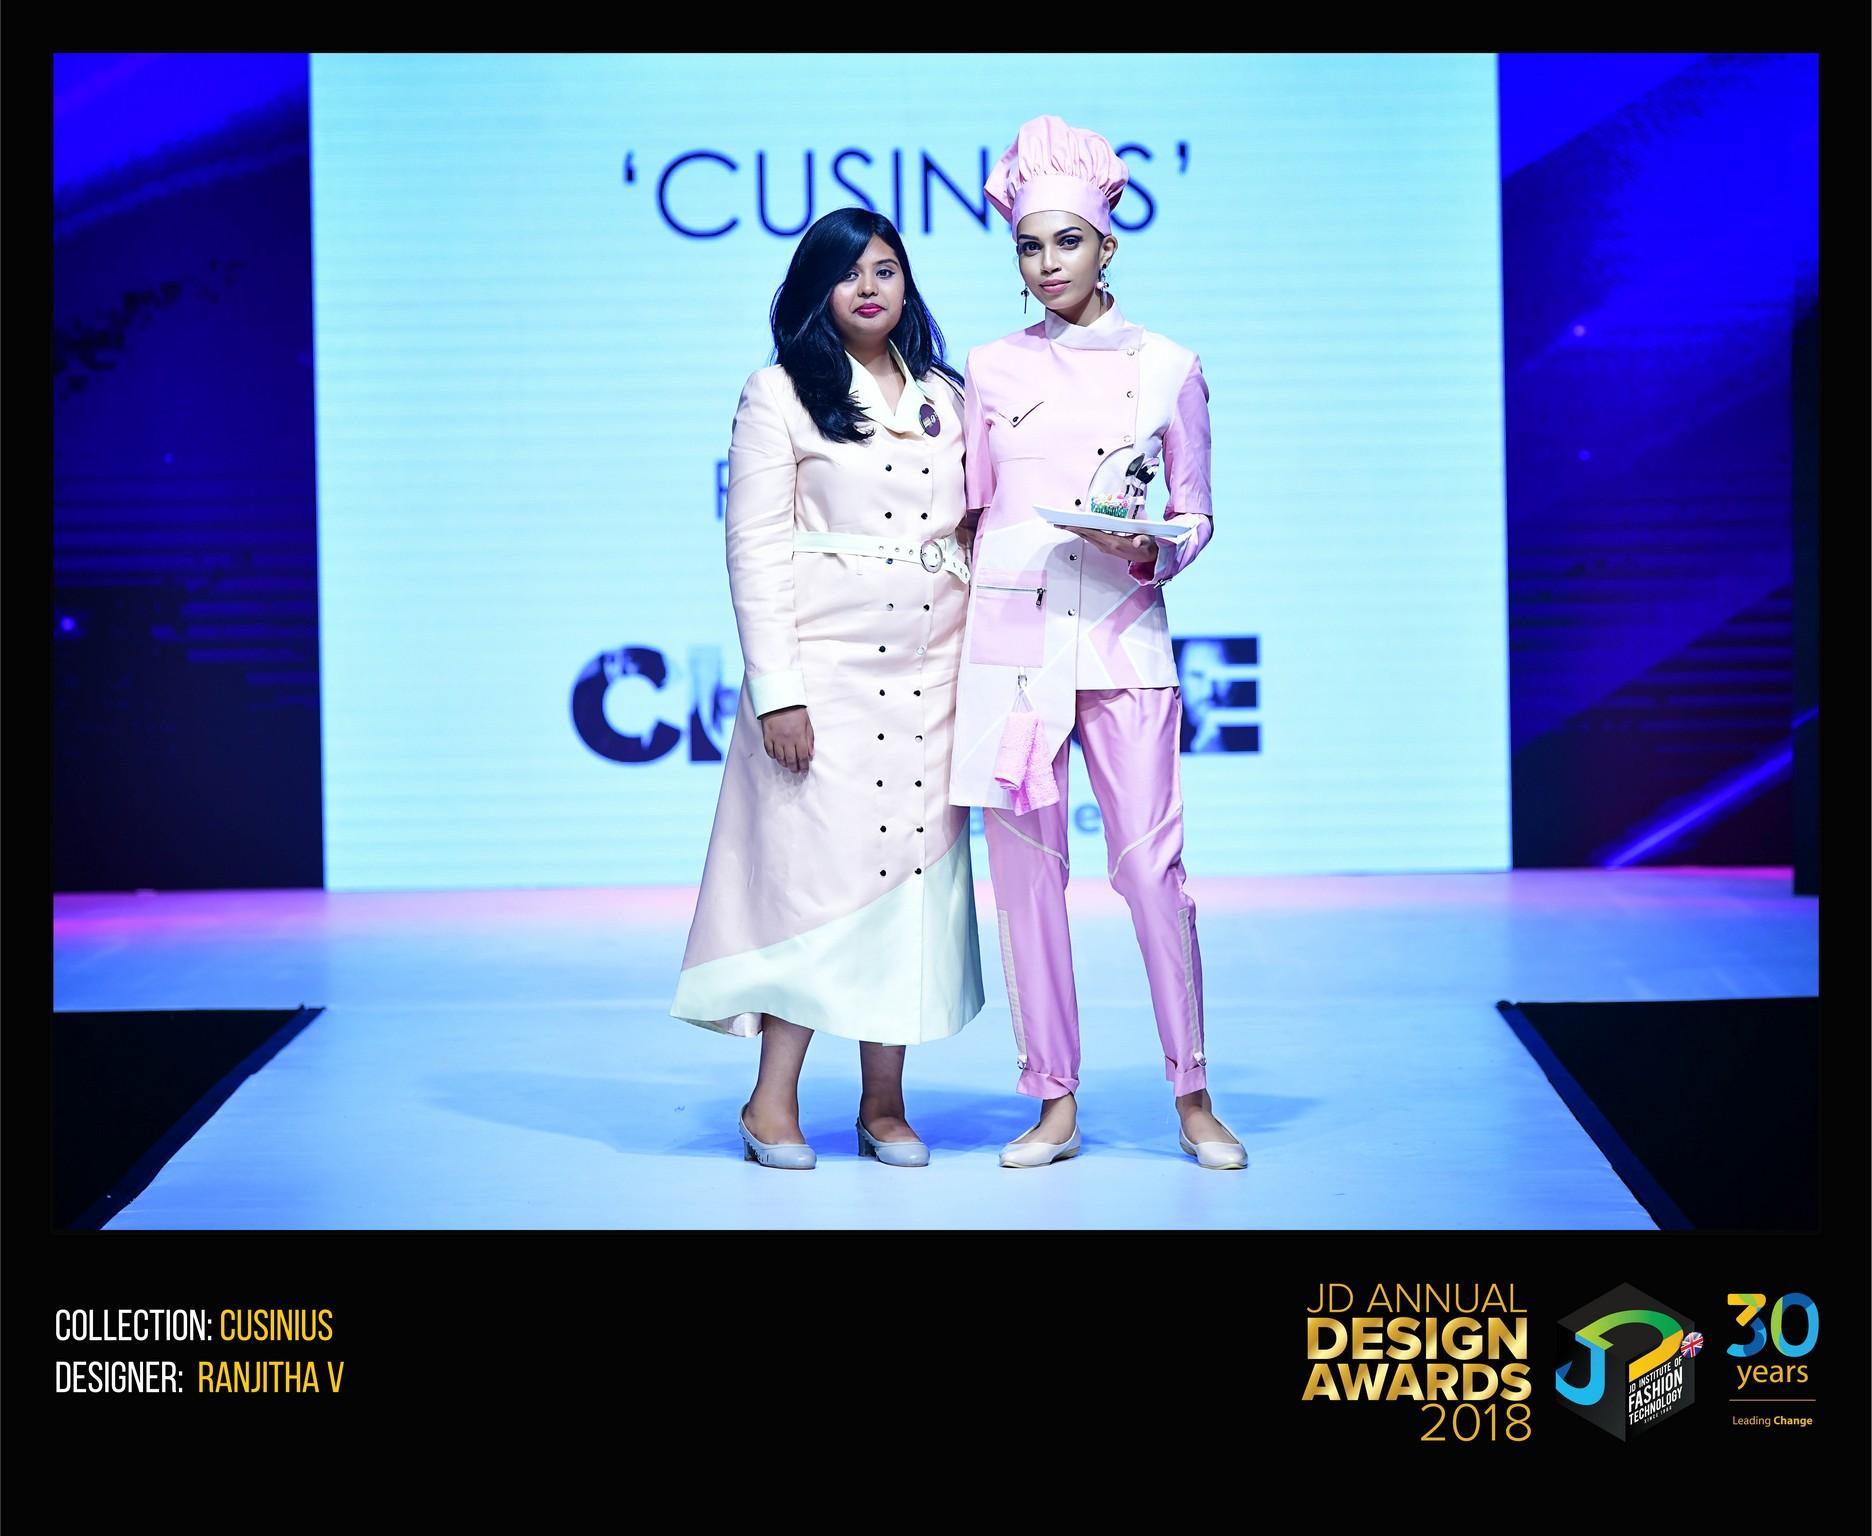 Cusinius – Change – JD Annual Design Awards 2018   Designer: Ranjitha   Photography : Jerin Nath (@jerin_nath) cusinius - CUSINIUS 11 - Cusinius – Change – JD Annual Design Awards 2018